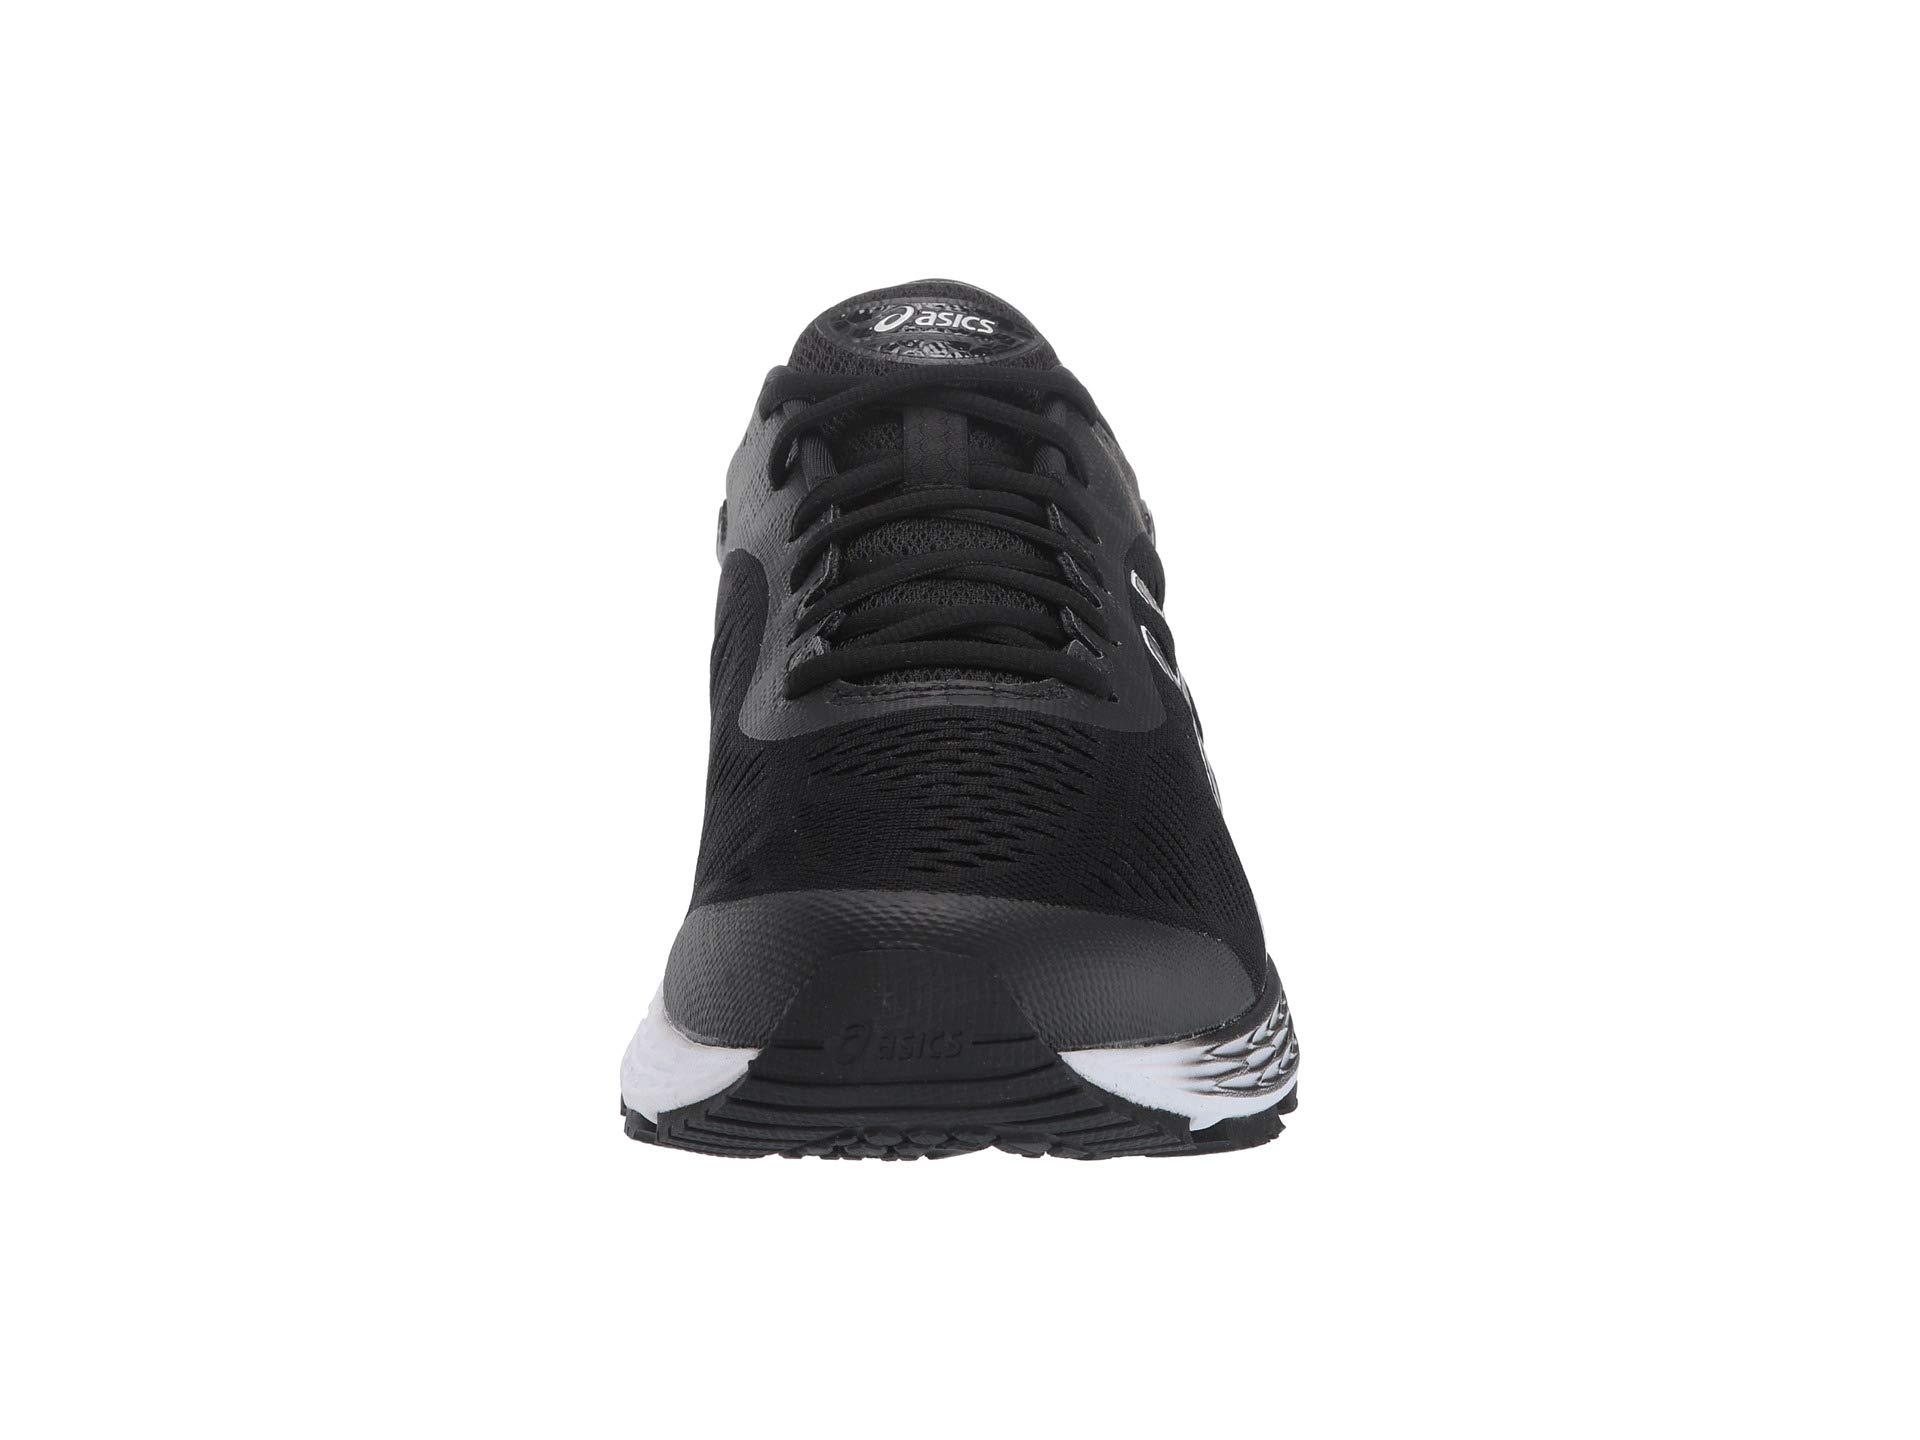 ASICS Gel Kayano 25 Men's Running Shoe, Black/Glacier Grey, 6.5 D US by ASICS (Image #5)